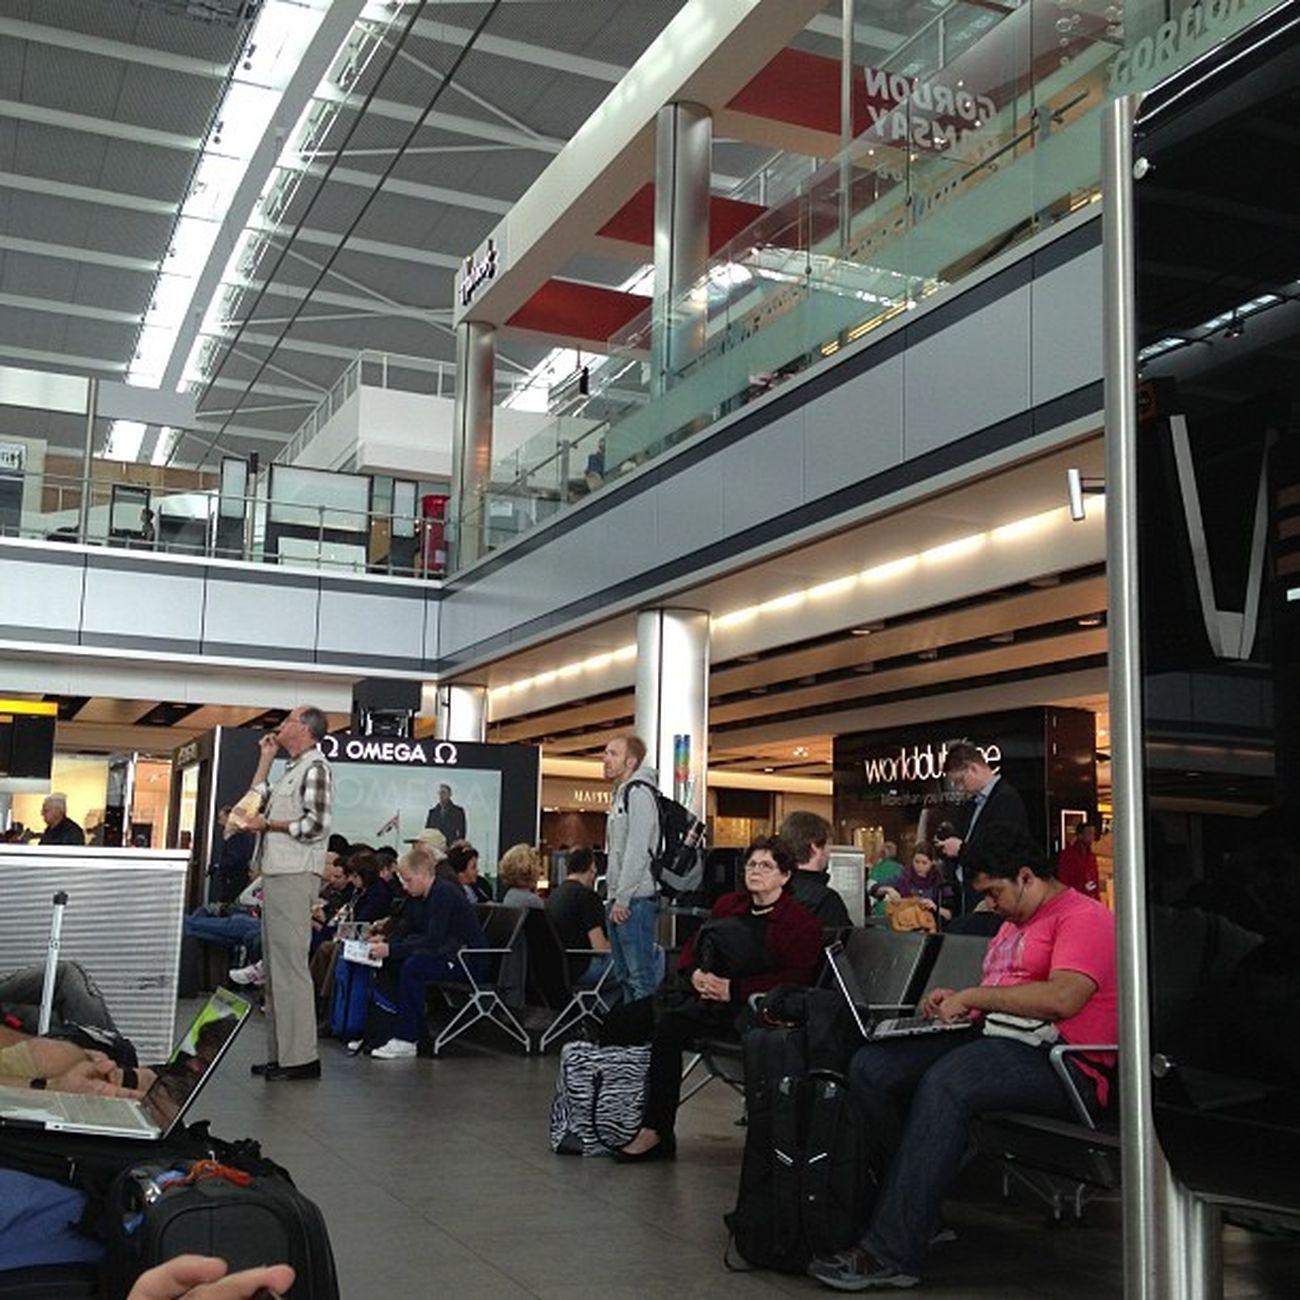 #london #heathrow #uk #iphoneonly #nofilter London Uk Iphoneonly Nofilter Heathrow